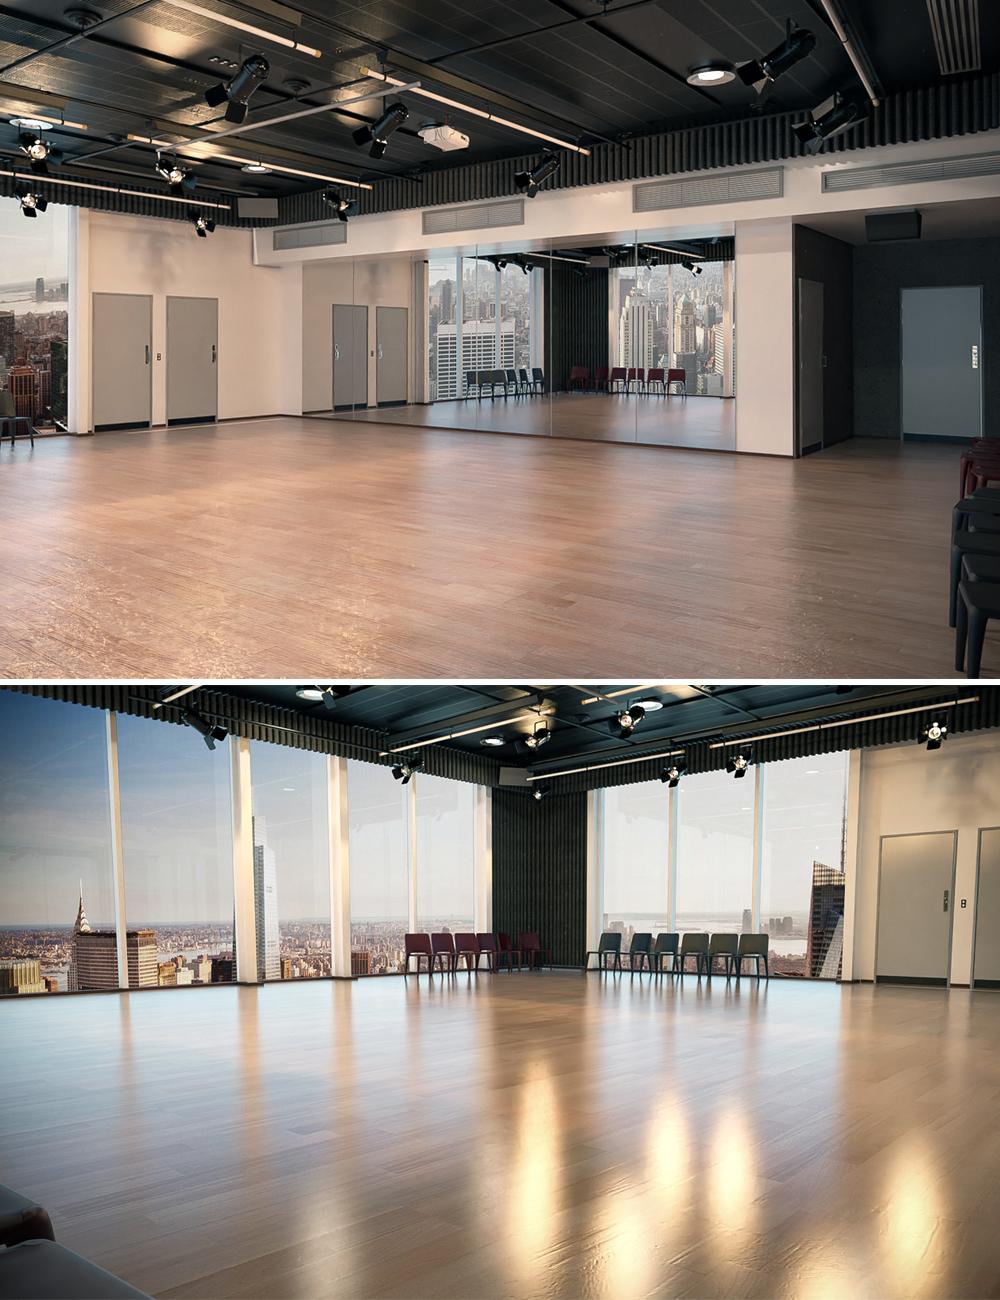 Dance Art Studio by: Tesla3dCorp, 3D Models by Daz 3D